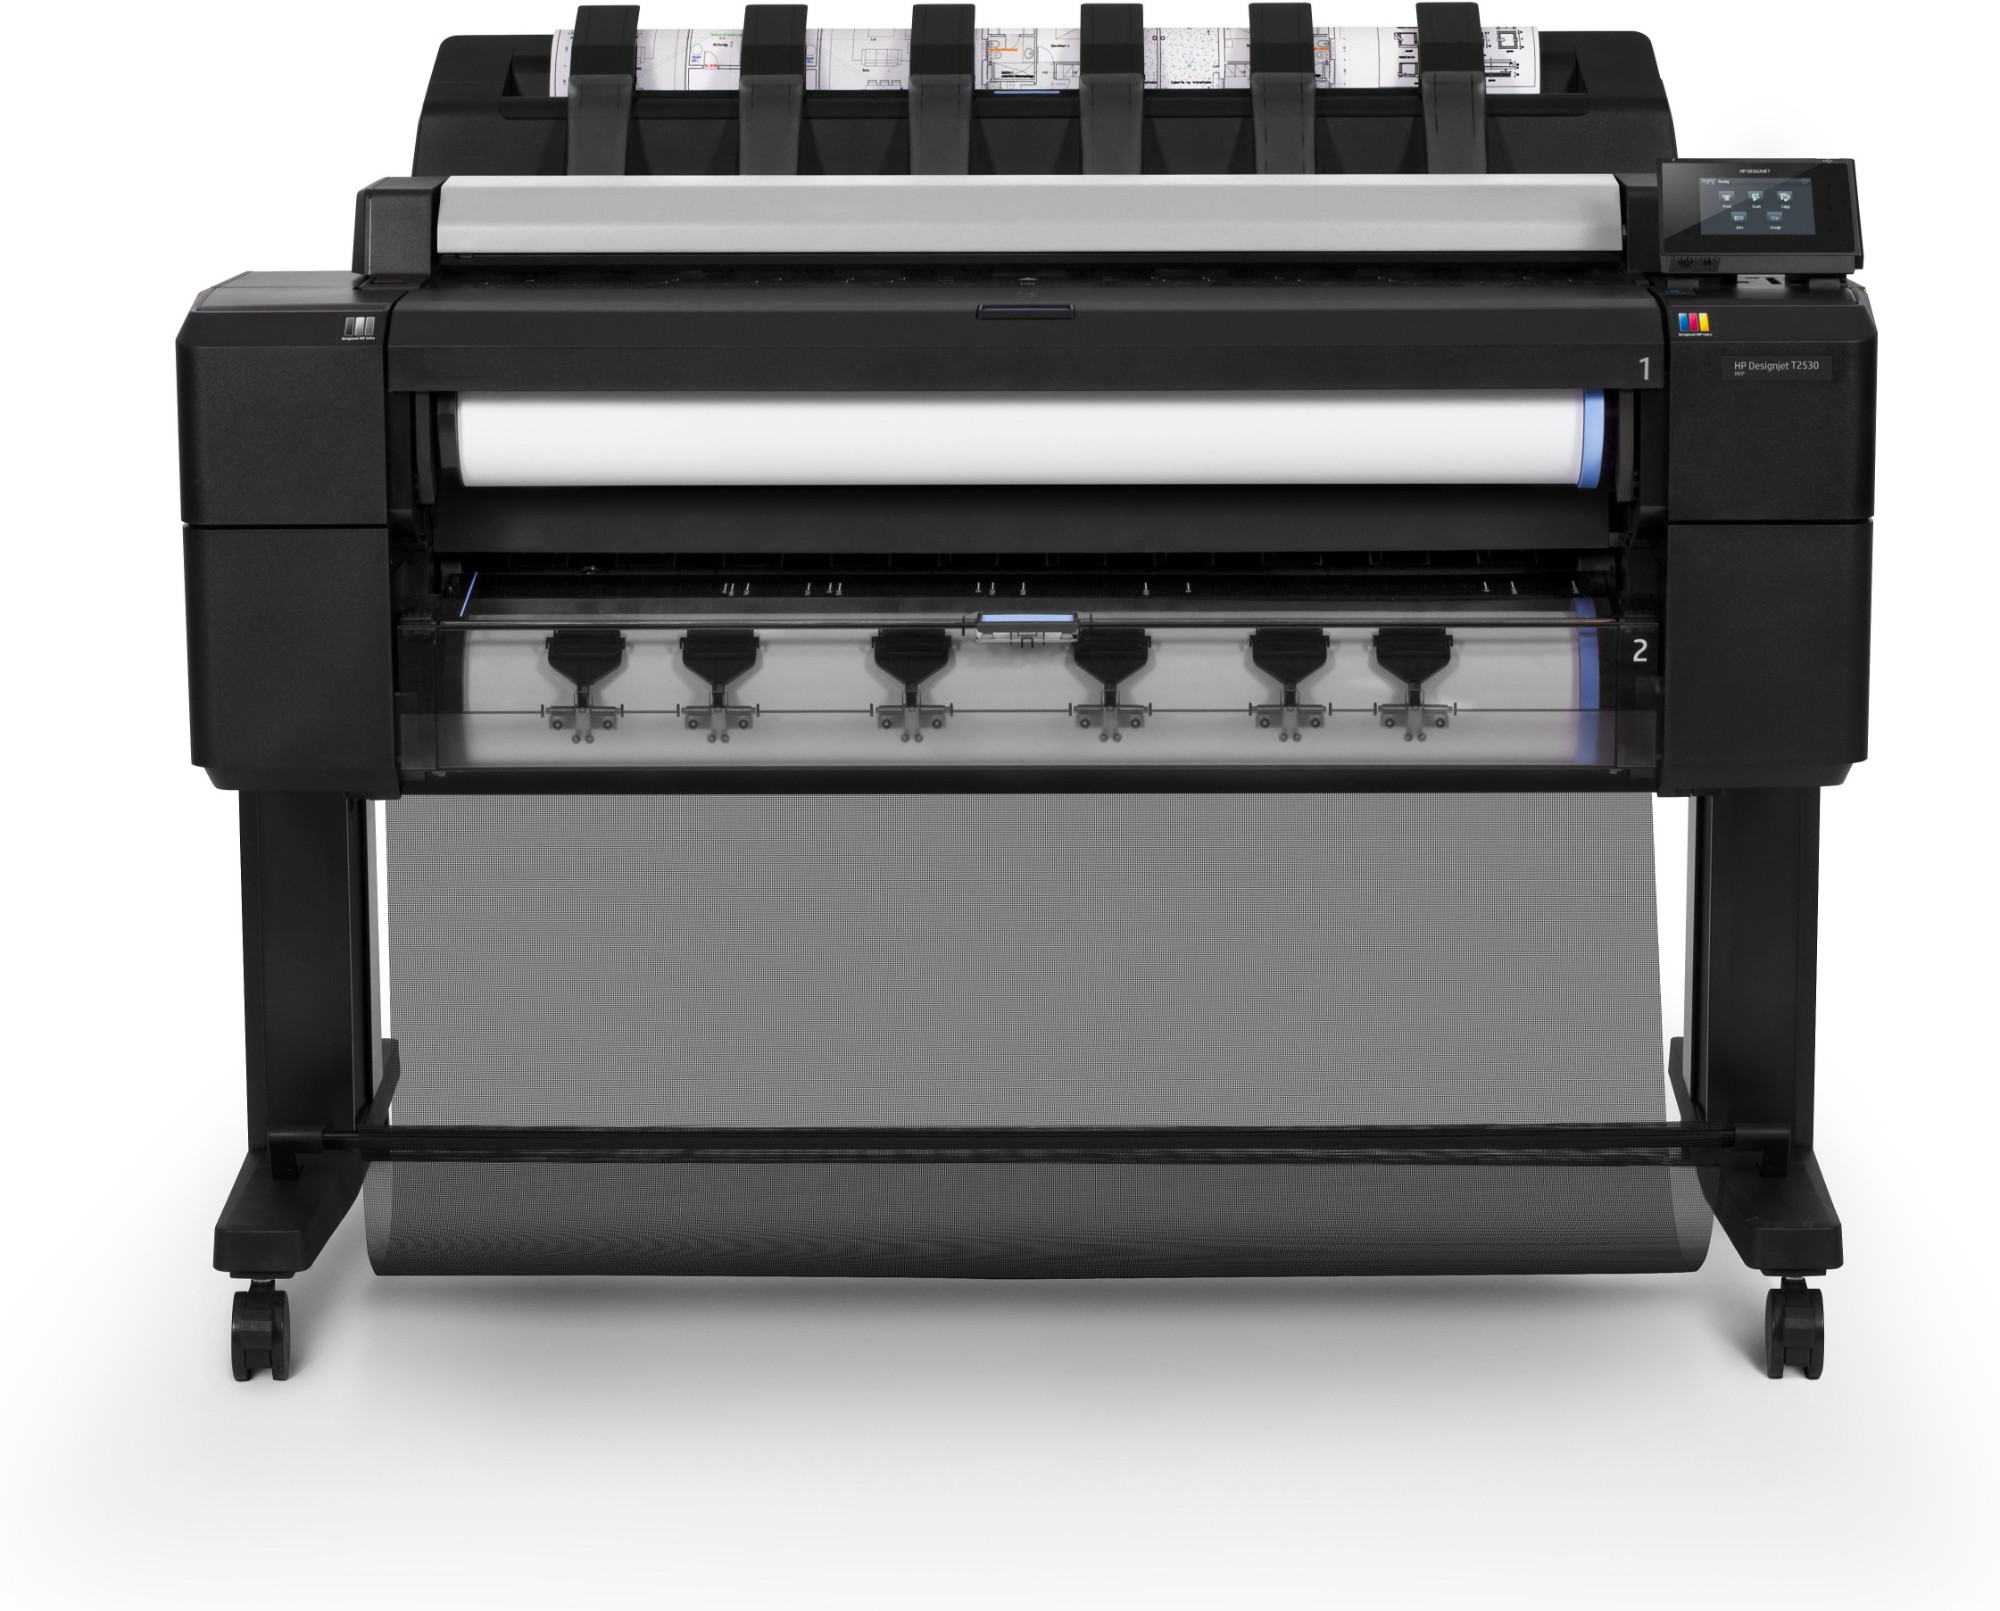 HP Designjet T2530 Ethernet LAN Colour 2400 x 1200DPI Thermal inkjet A0 (841 x 1189 mm) large format printer